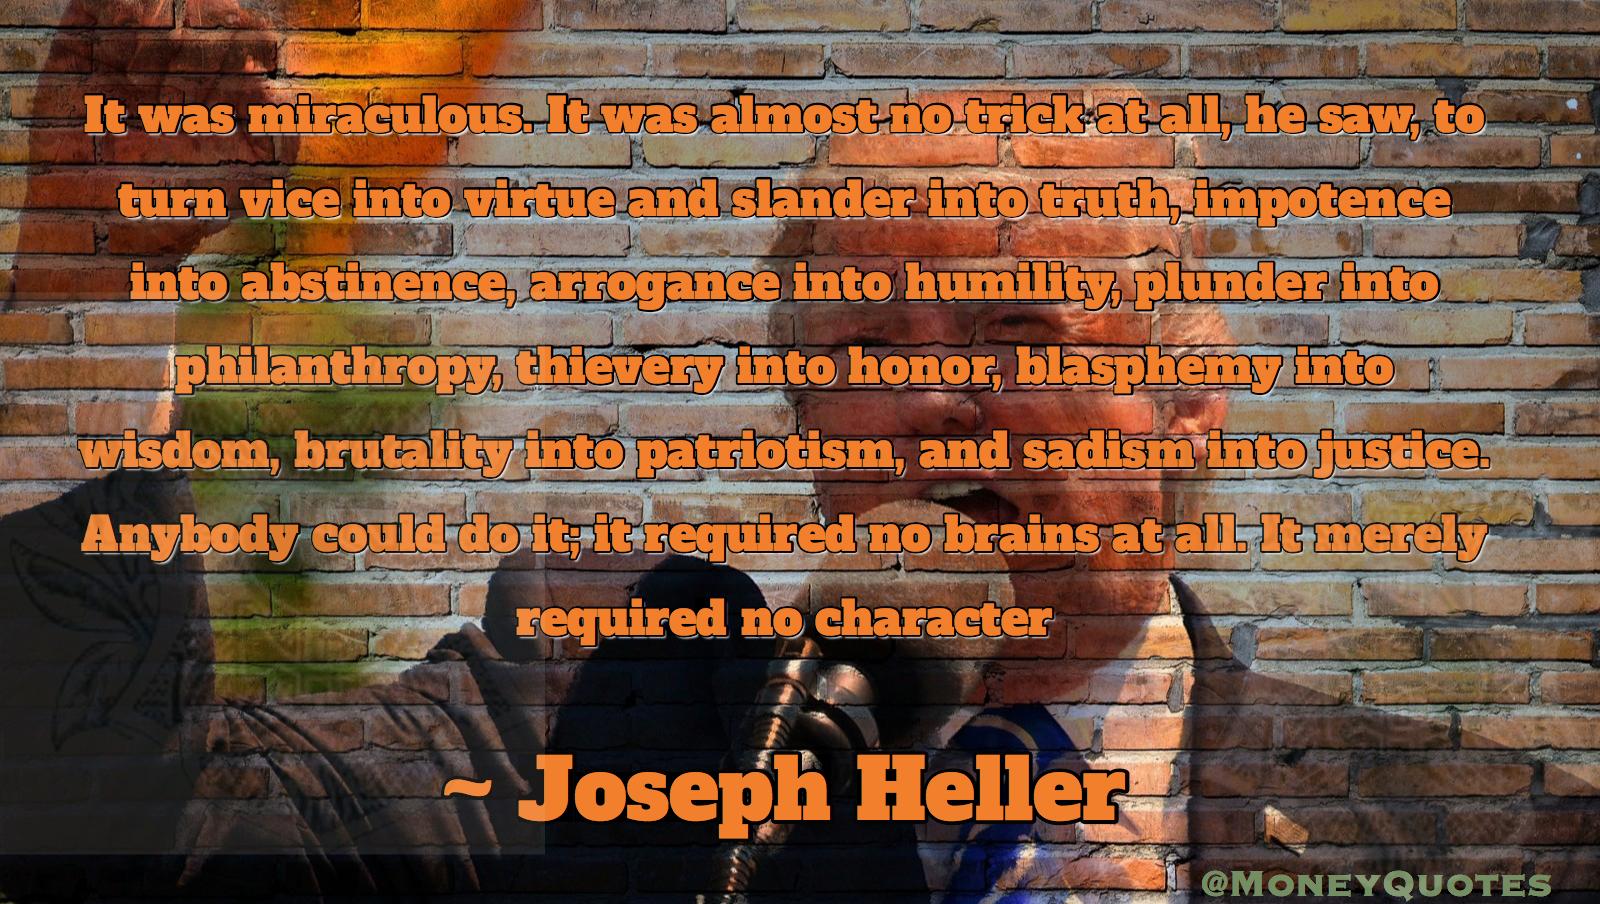 Joseph Heller IG Plunder Philanthropy Thievery Honor